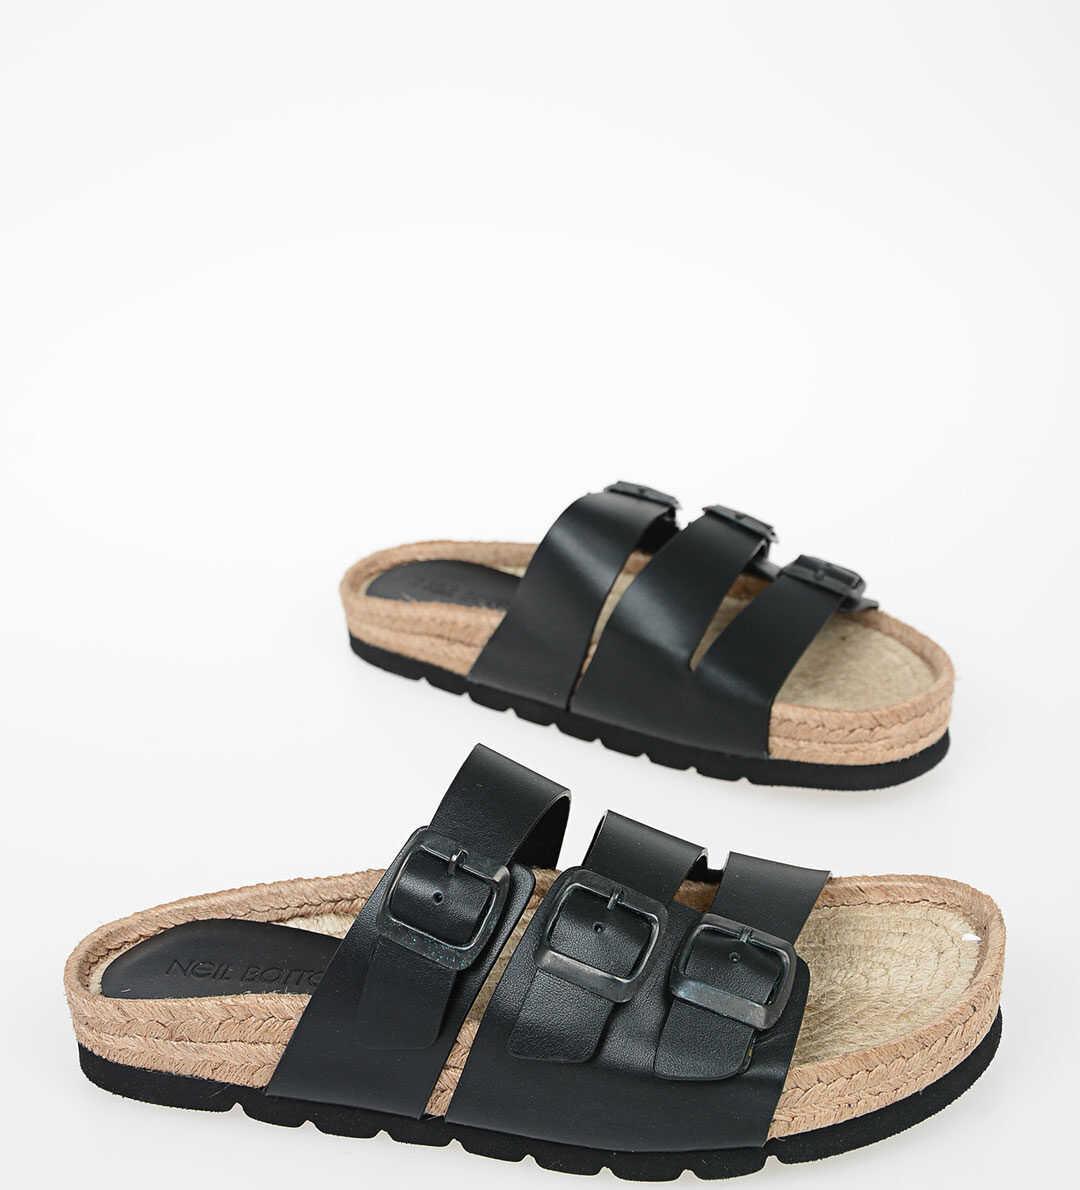 Neil Barrett Leather Sandals BLACK